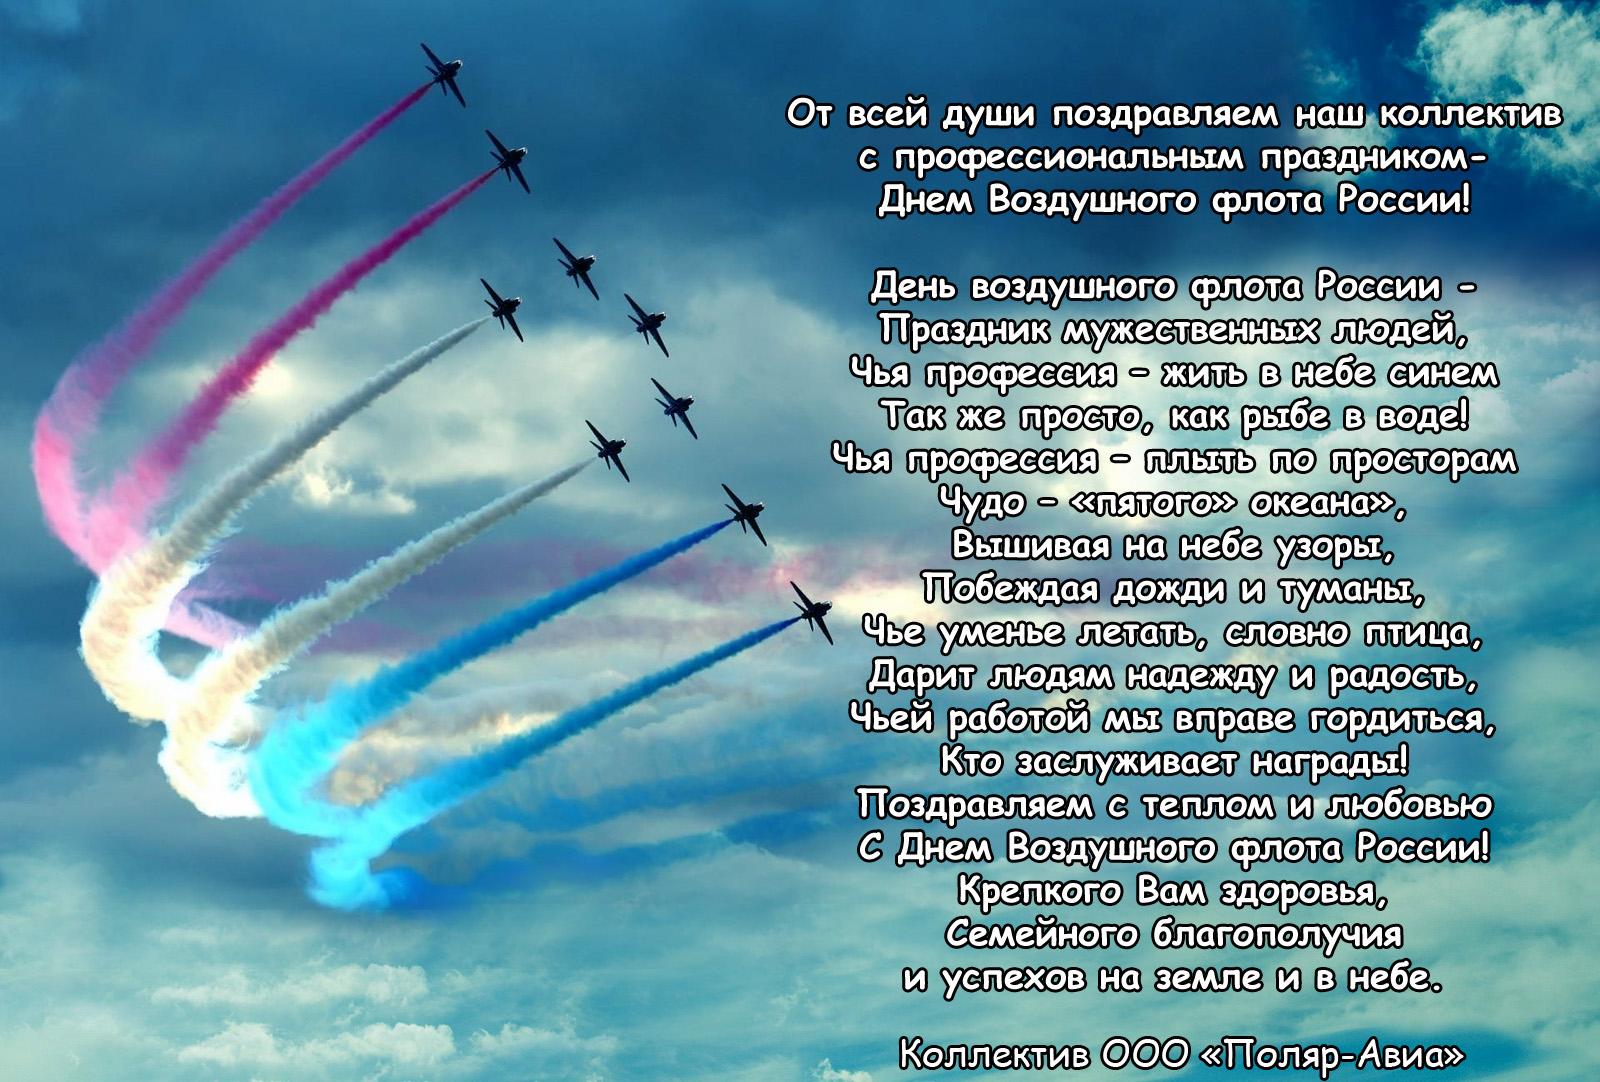 Поздравление с днем воздушного флота от 426